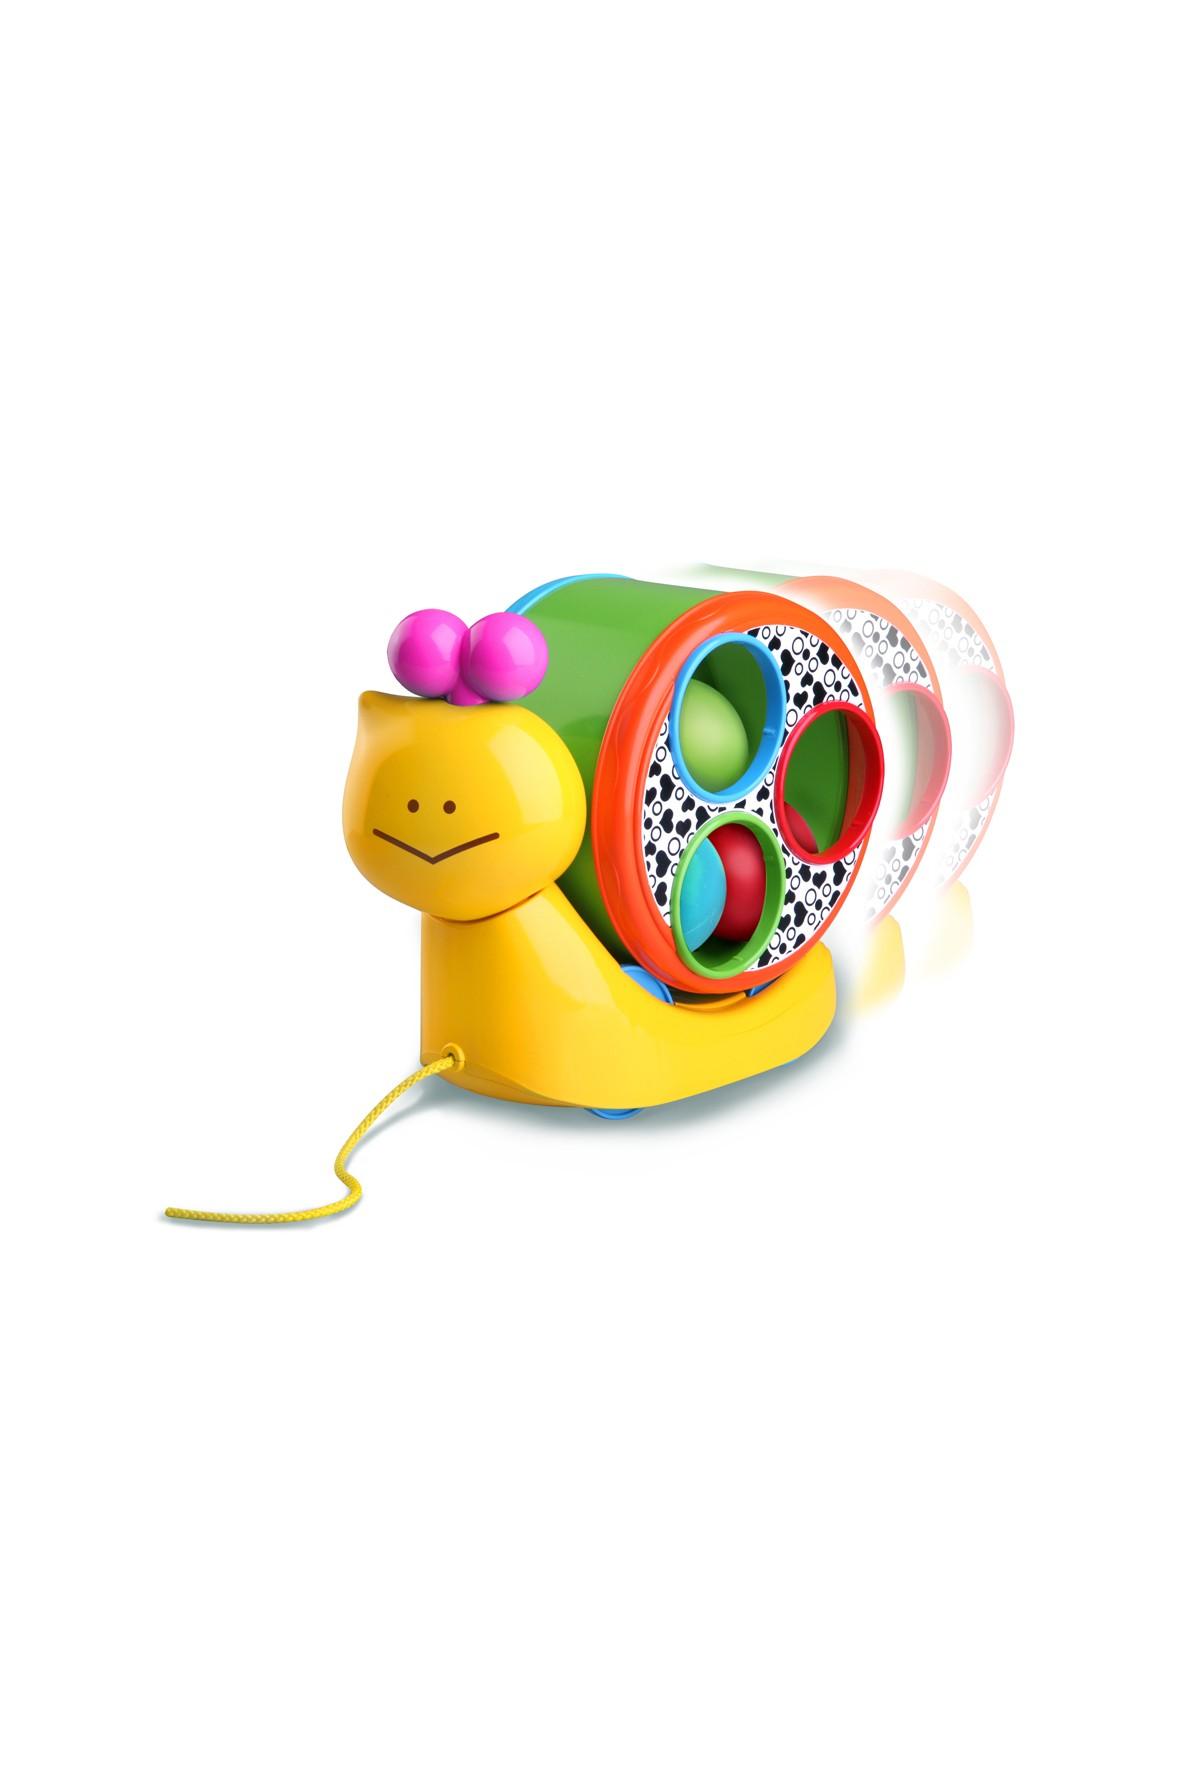 Sorter - ślimak na sznurku